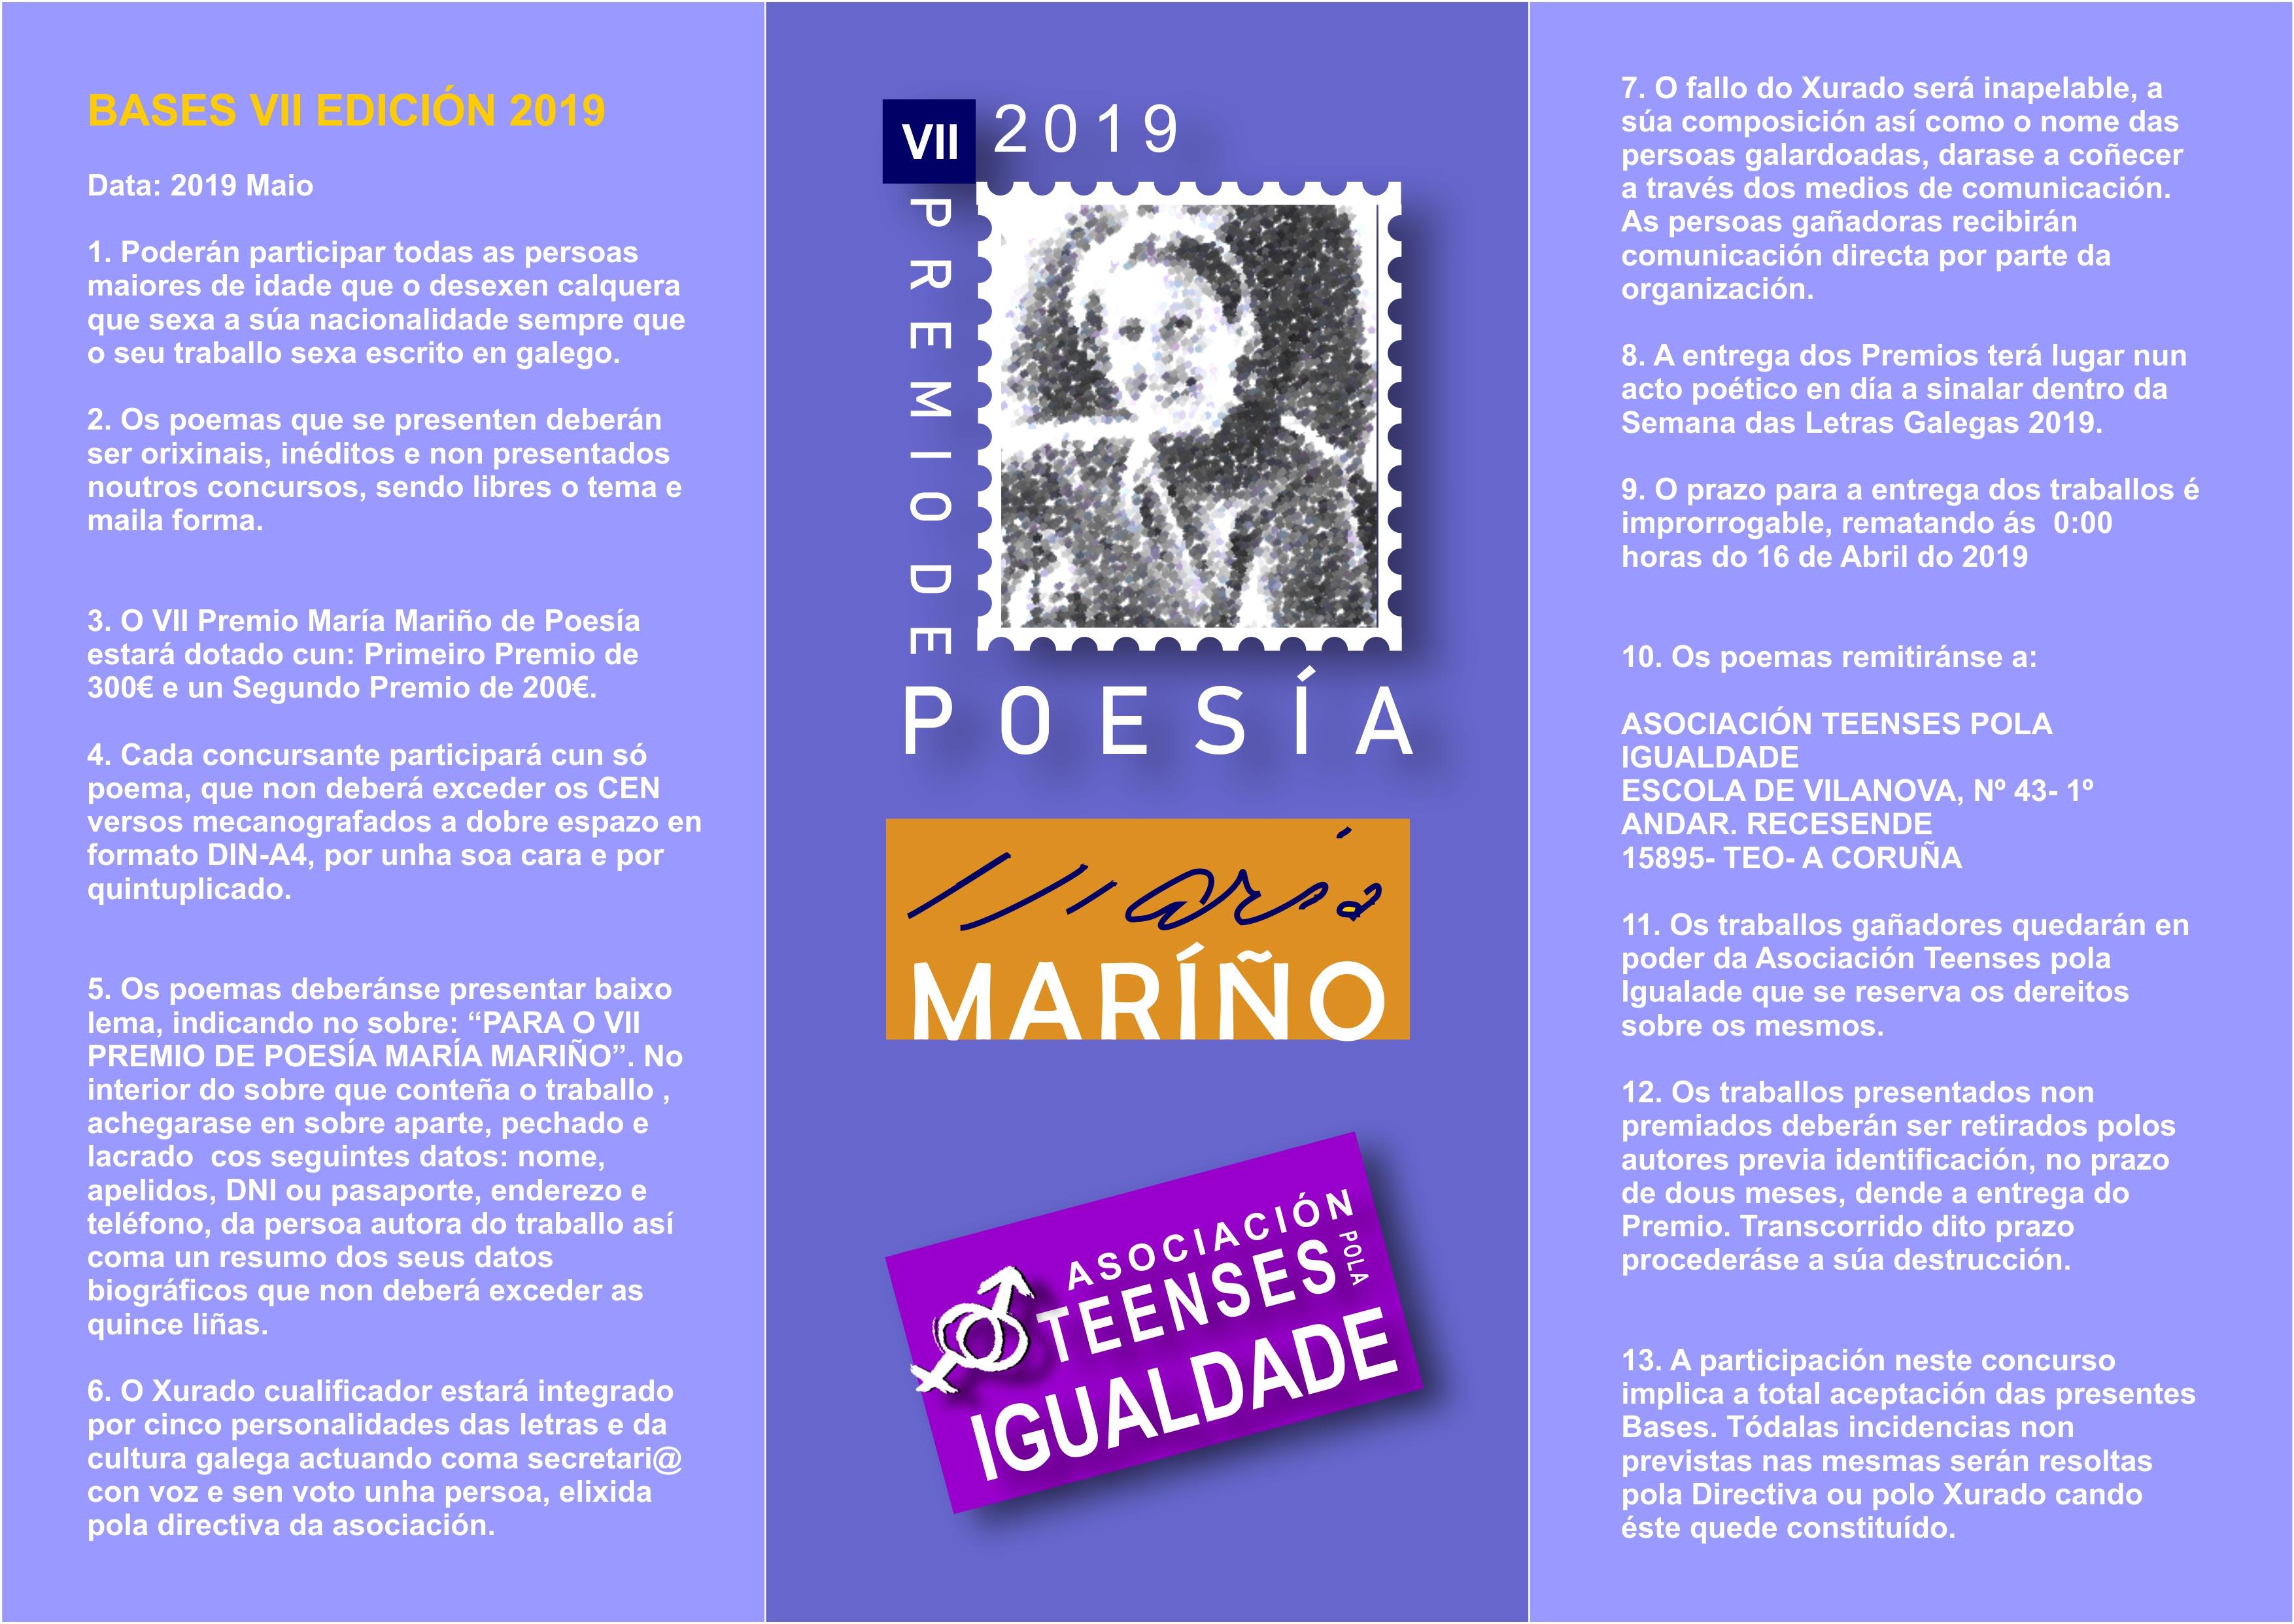 CONVOCADO O VII PREMIO DE POESIA MARIA MARIÑO